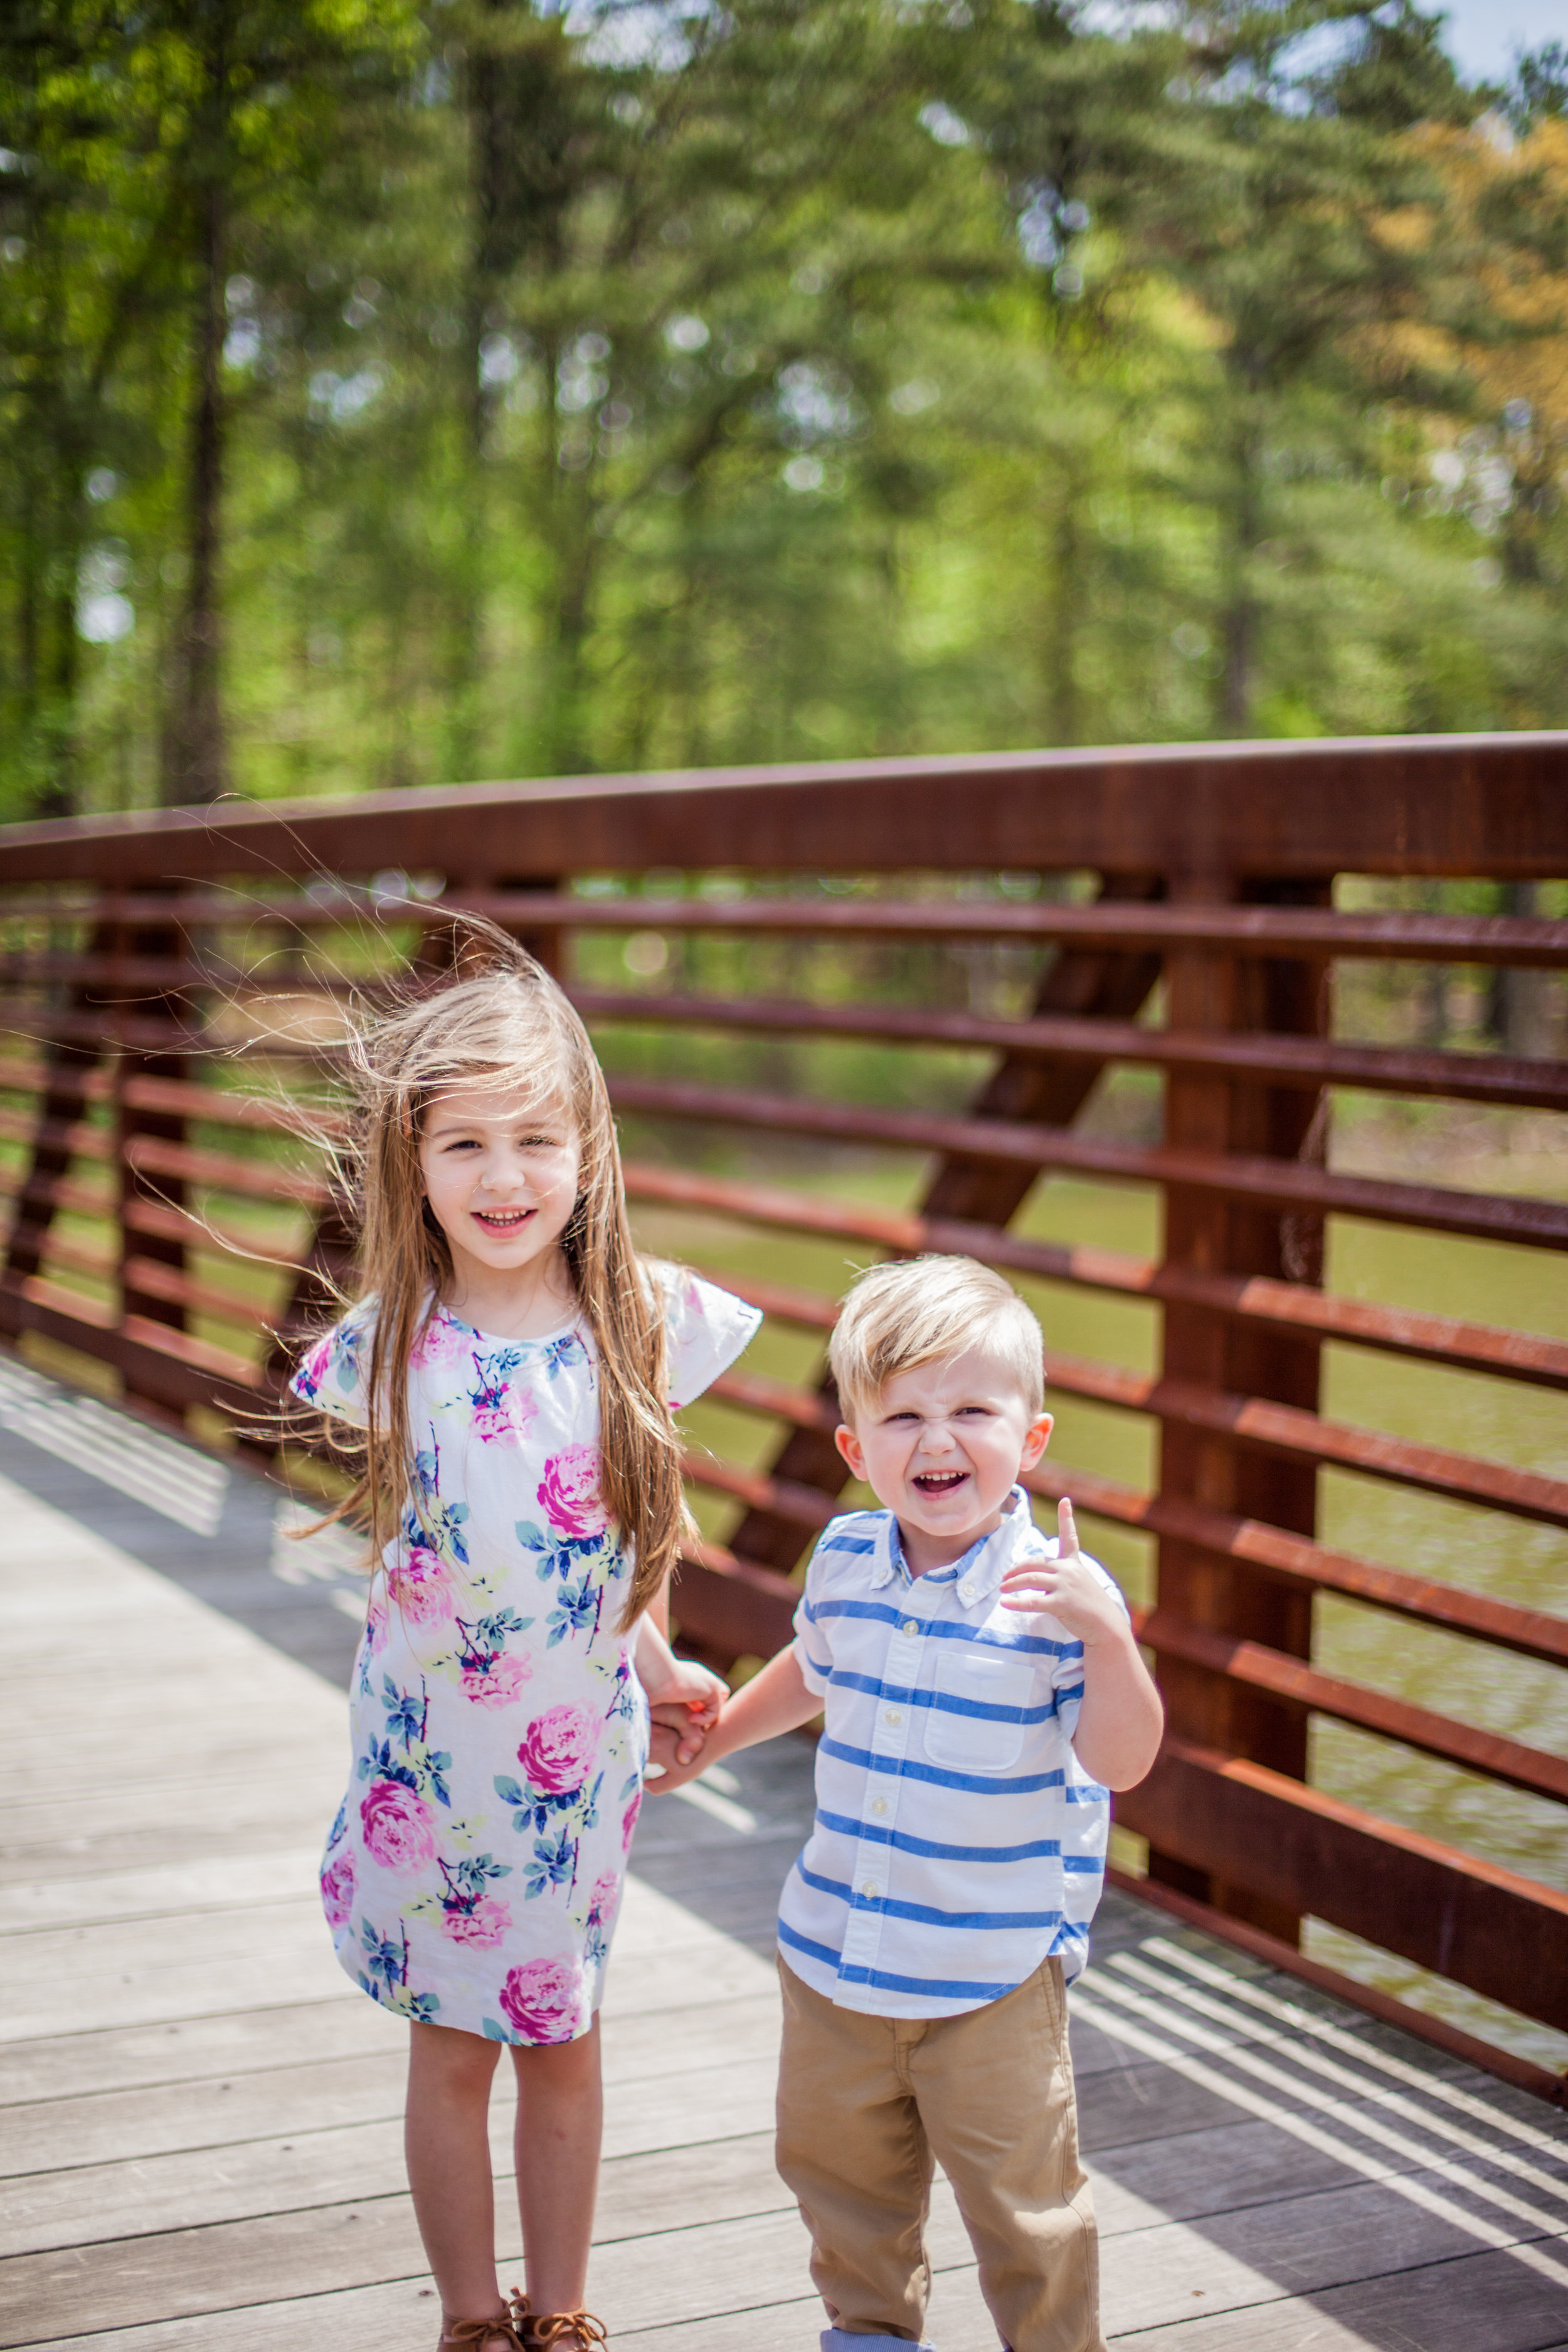 woodstock-family-photography-mini-session-acworth-beach-57.jpg